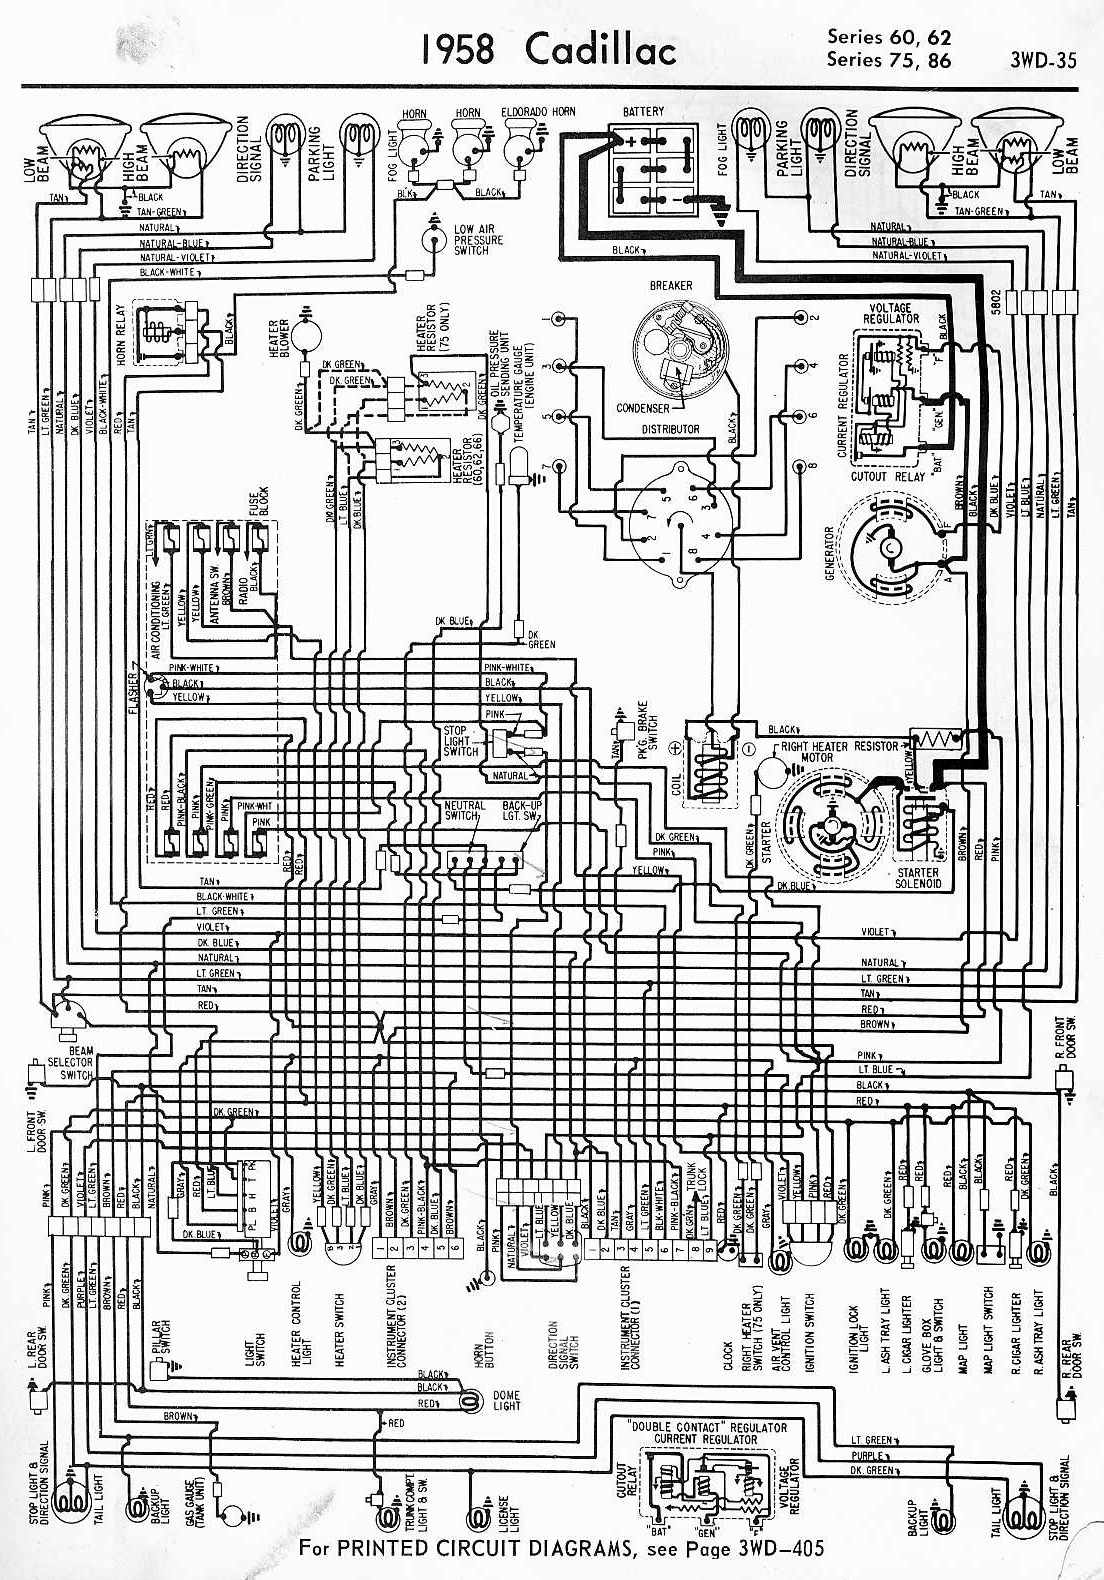 hight resolution of 1948 cadillac wiring diagram wiring diagrams schema mustang fuse box 1948 cadillac fuse box